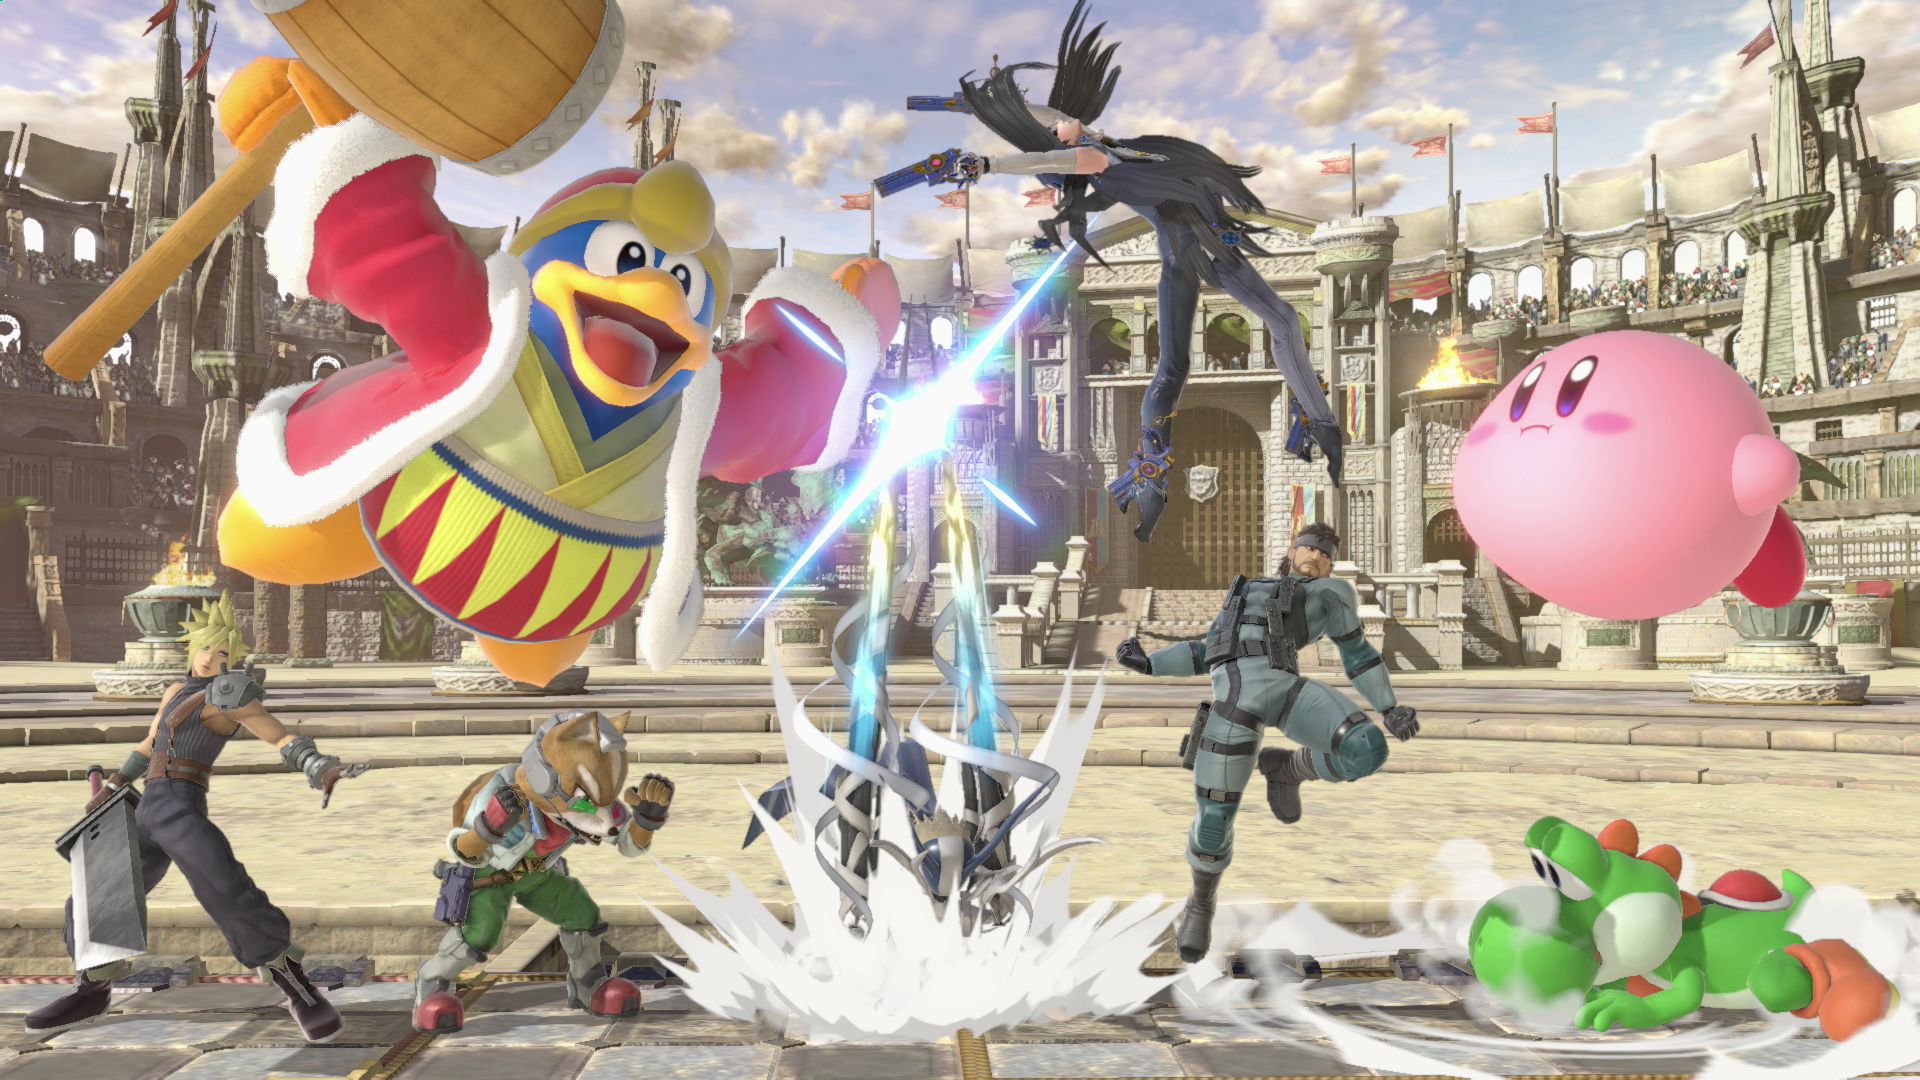 Super Smash Bros Ultimate Hd Wallpaper Background Image